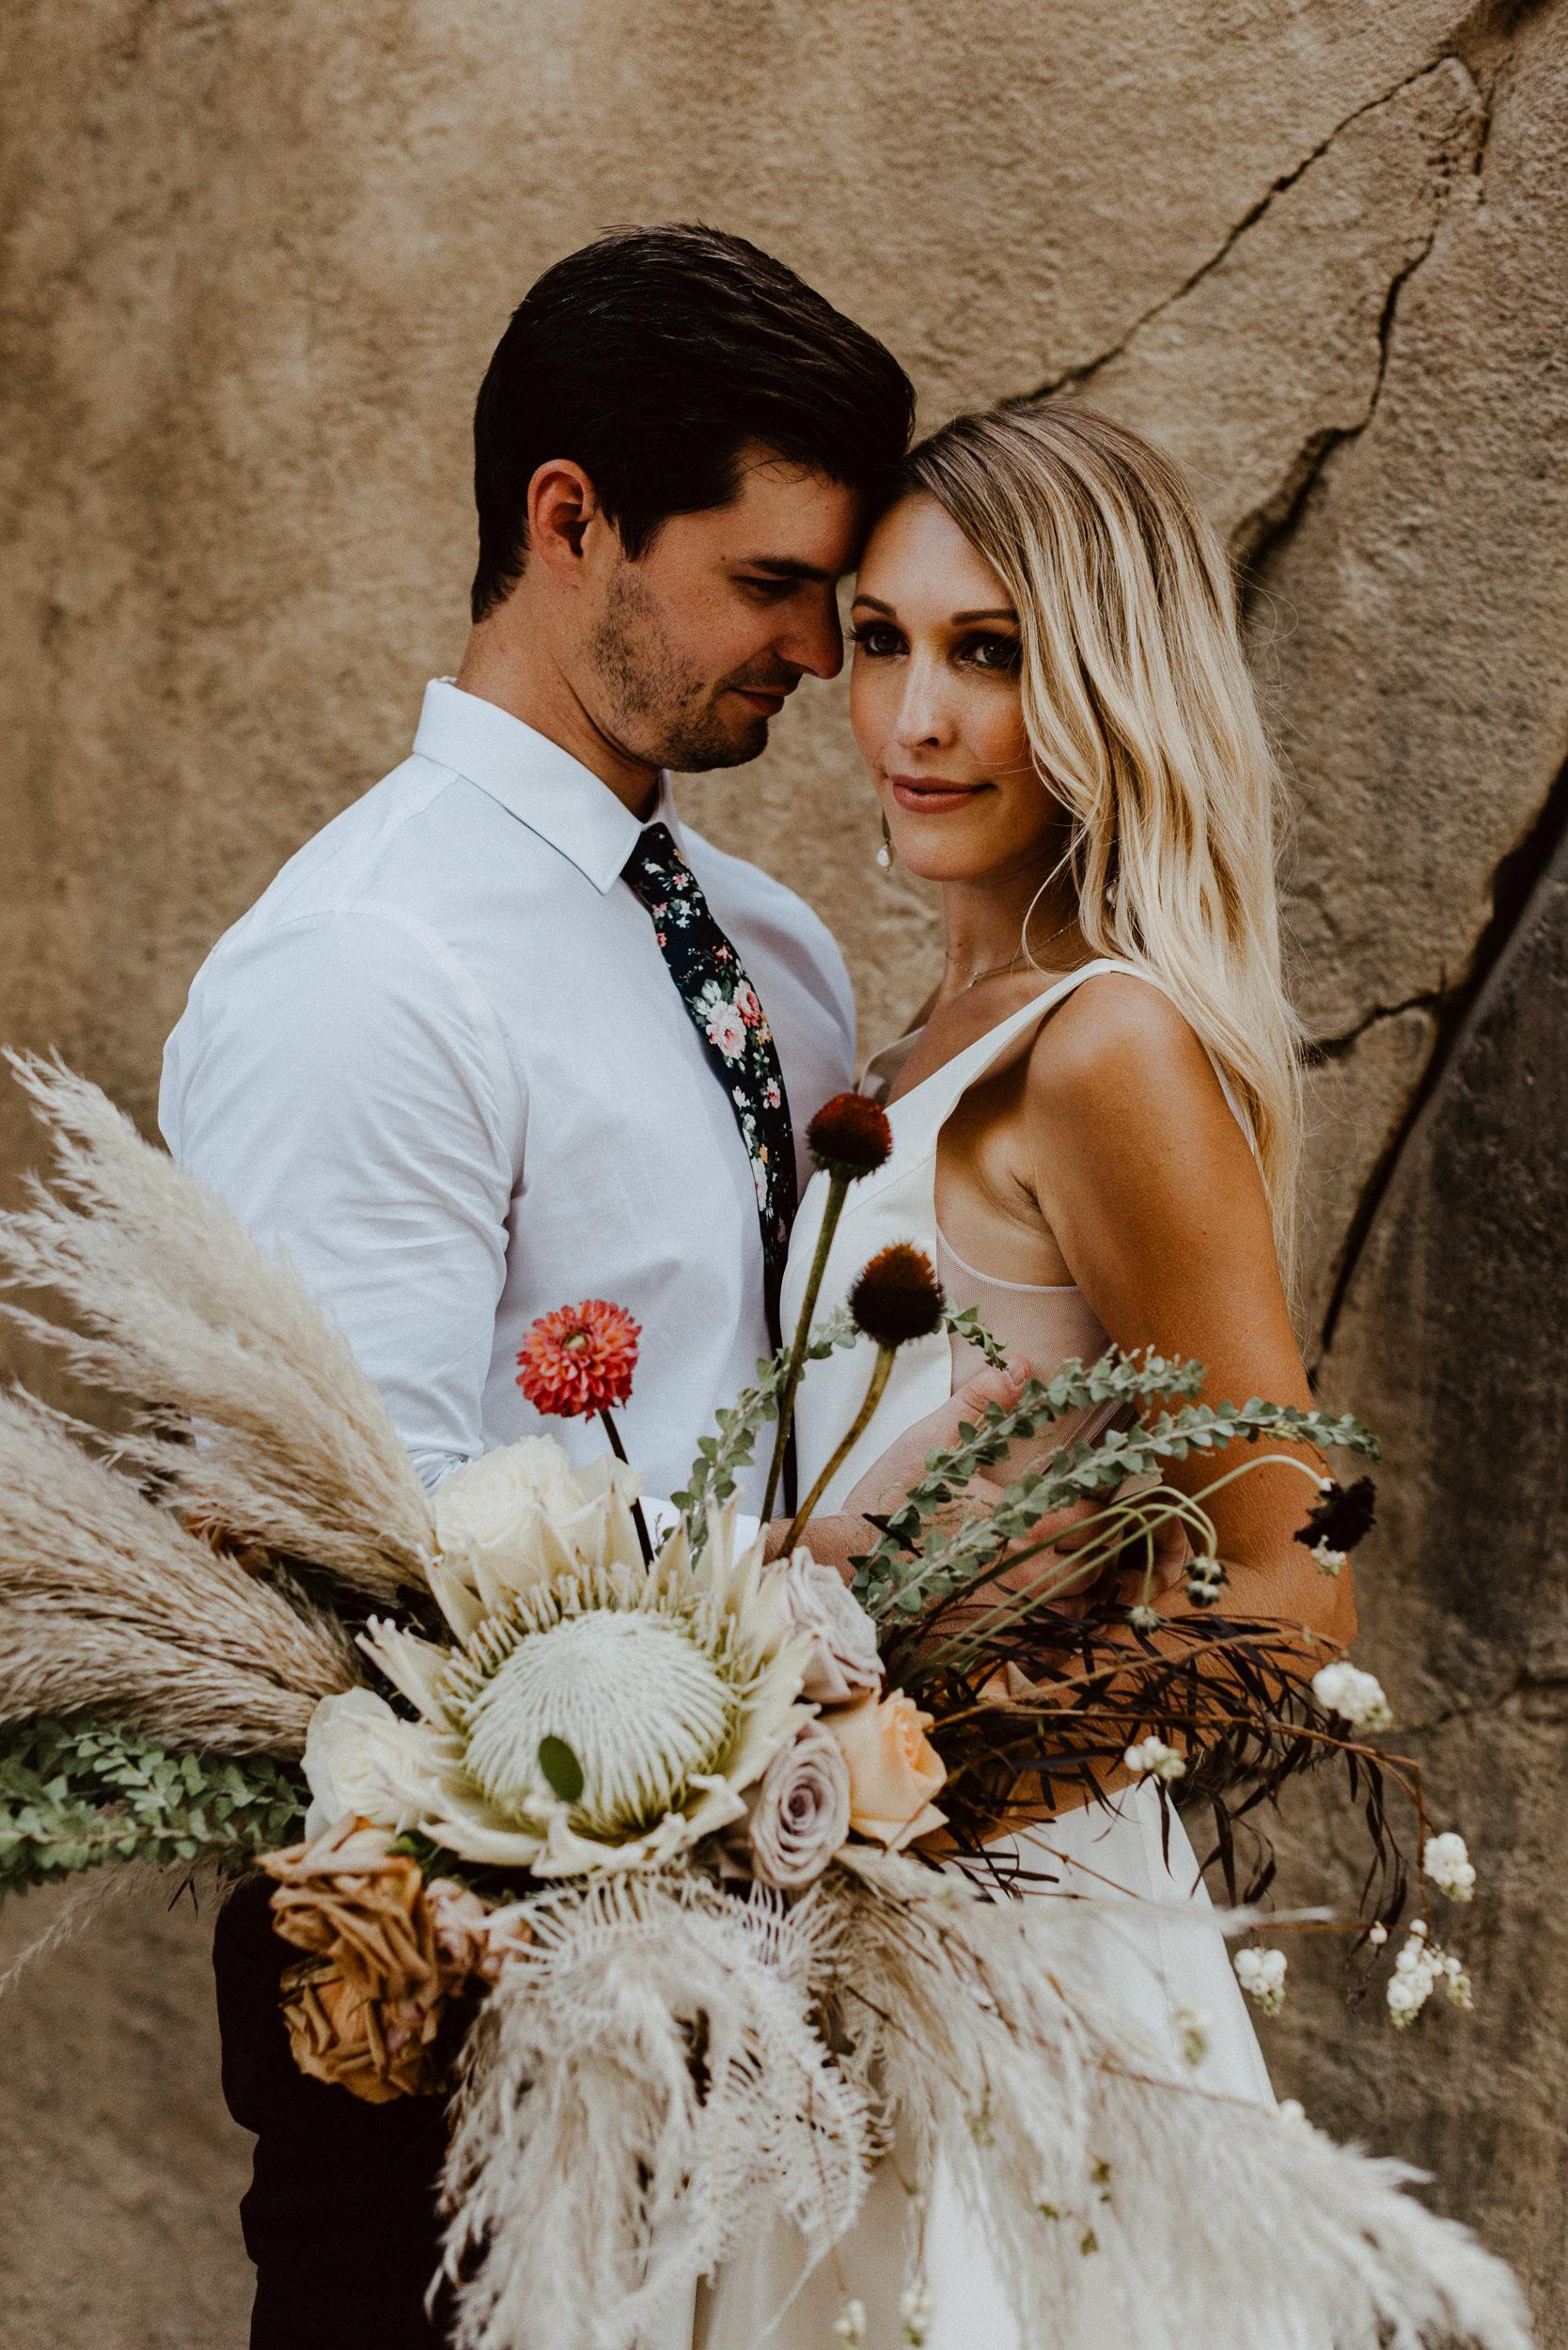 sChelsie + Chris - The Desert Shootout Wedding Romantics at The Living Desert-121.jpg